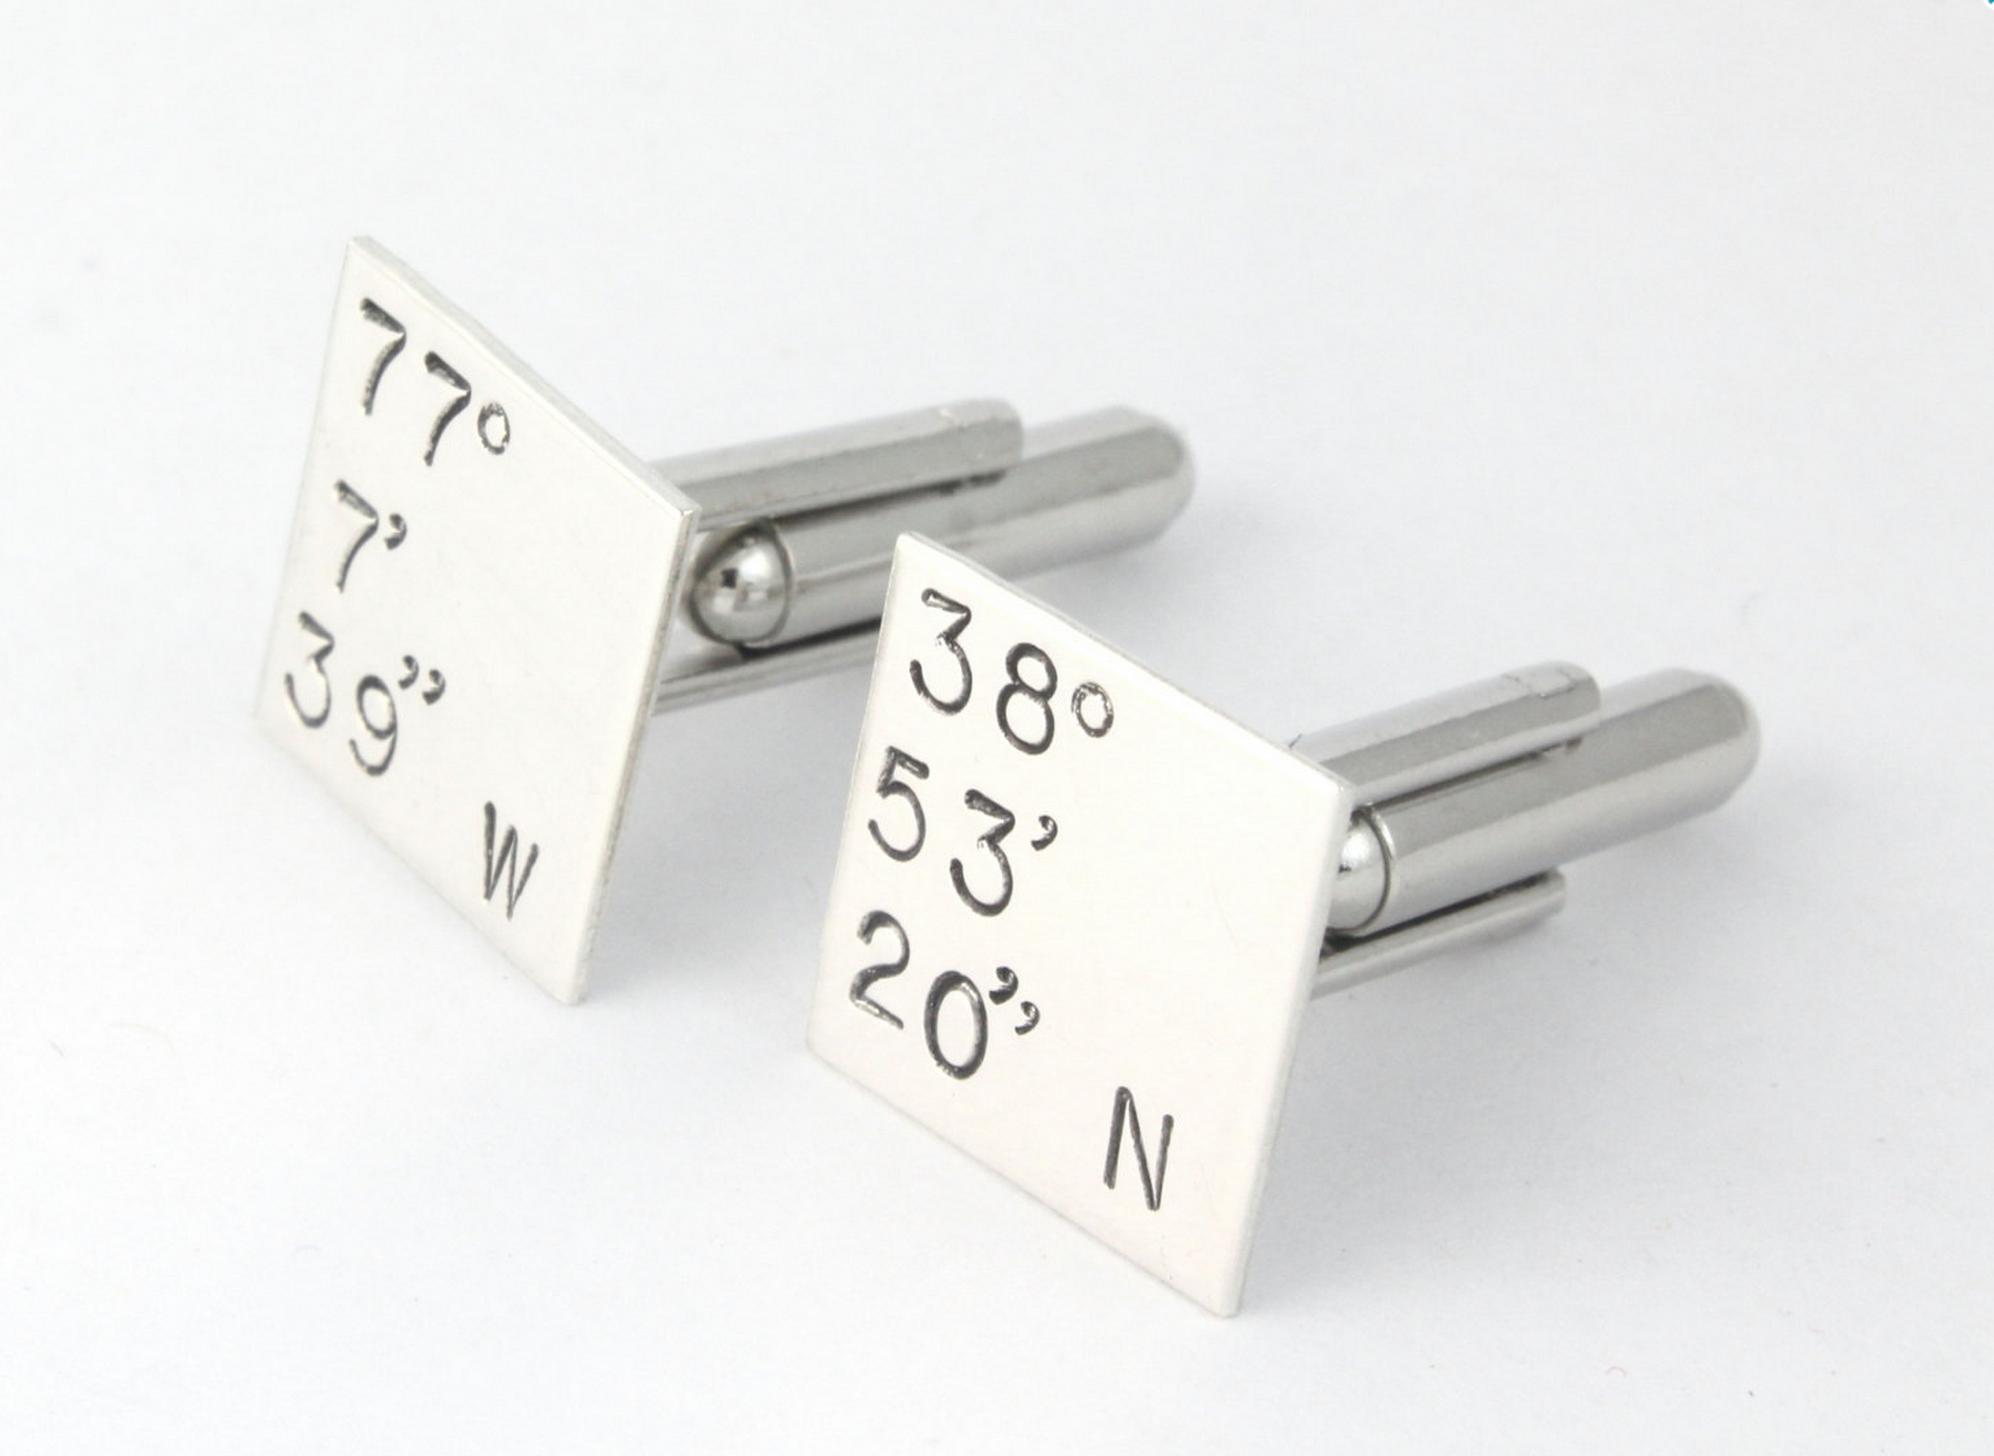 Latitude and Longitude Coordinate Cufflinks by TheSilverDiva